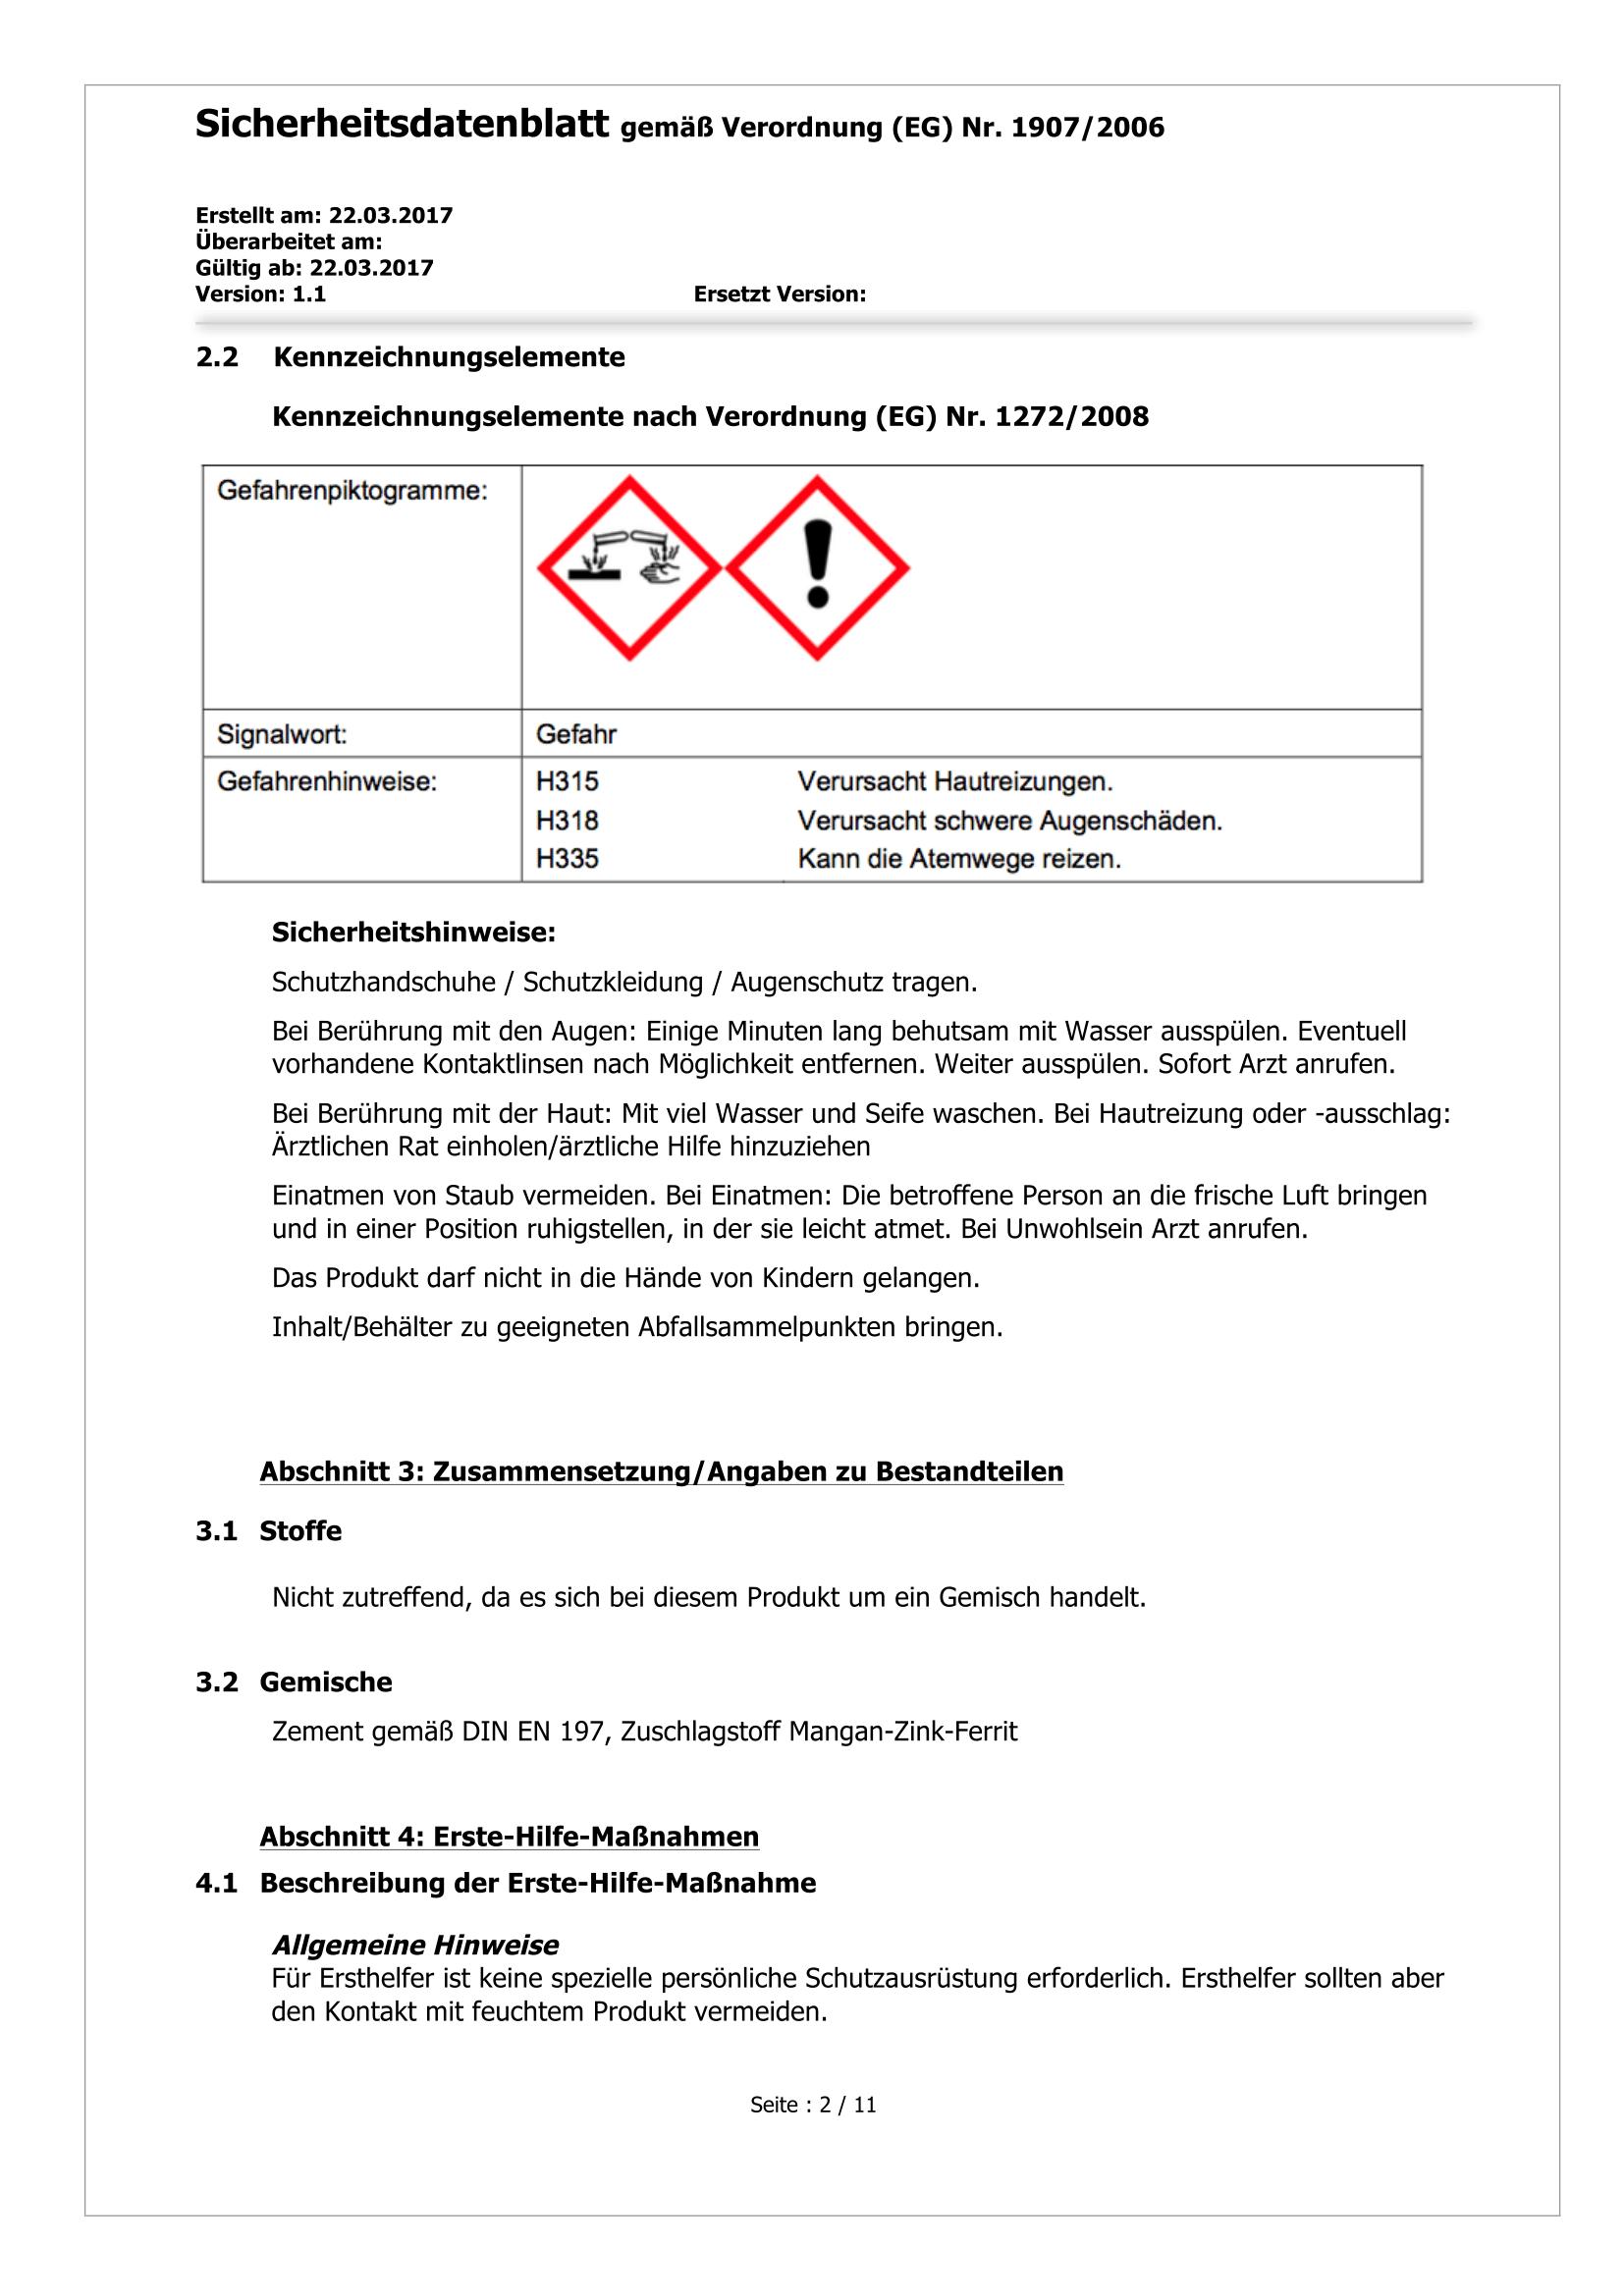 MSDB_MC40-02.png